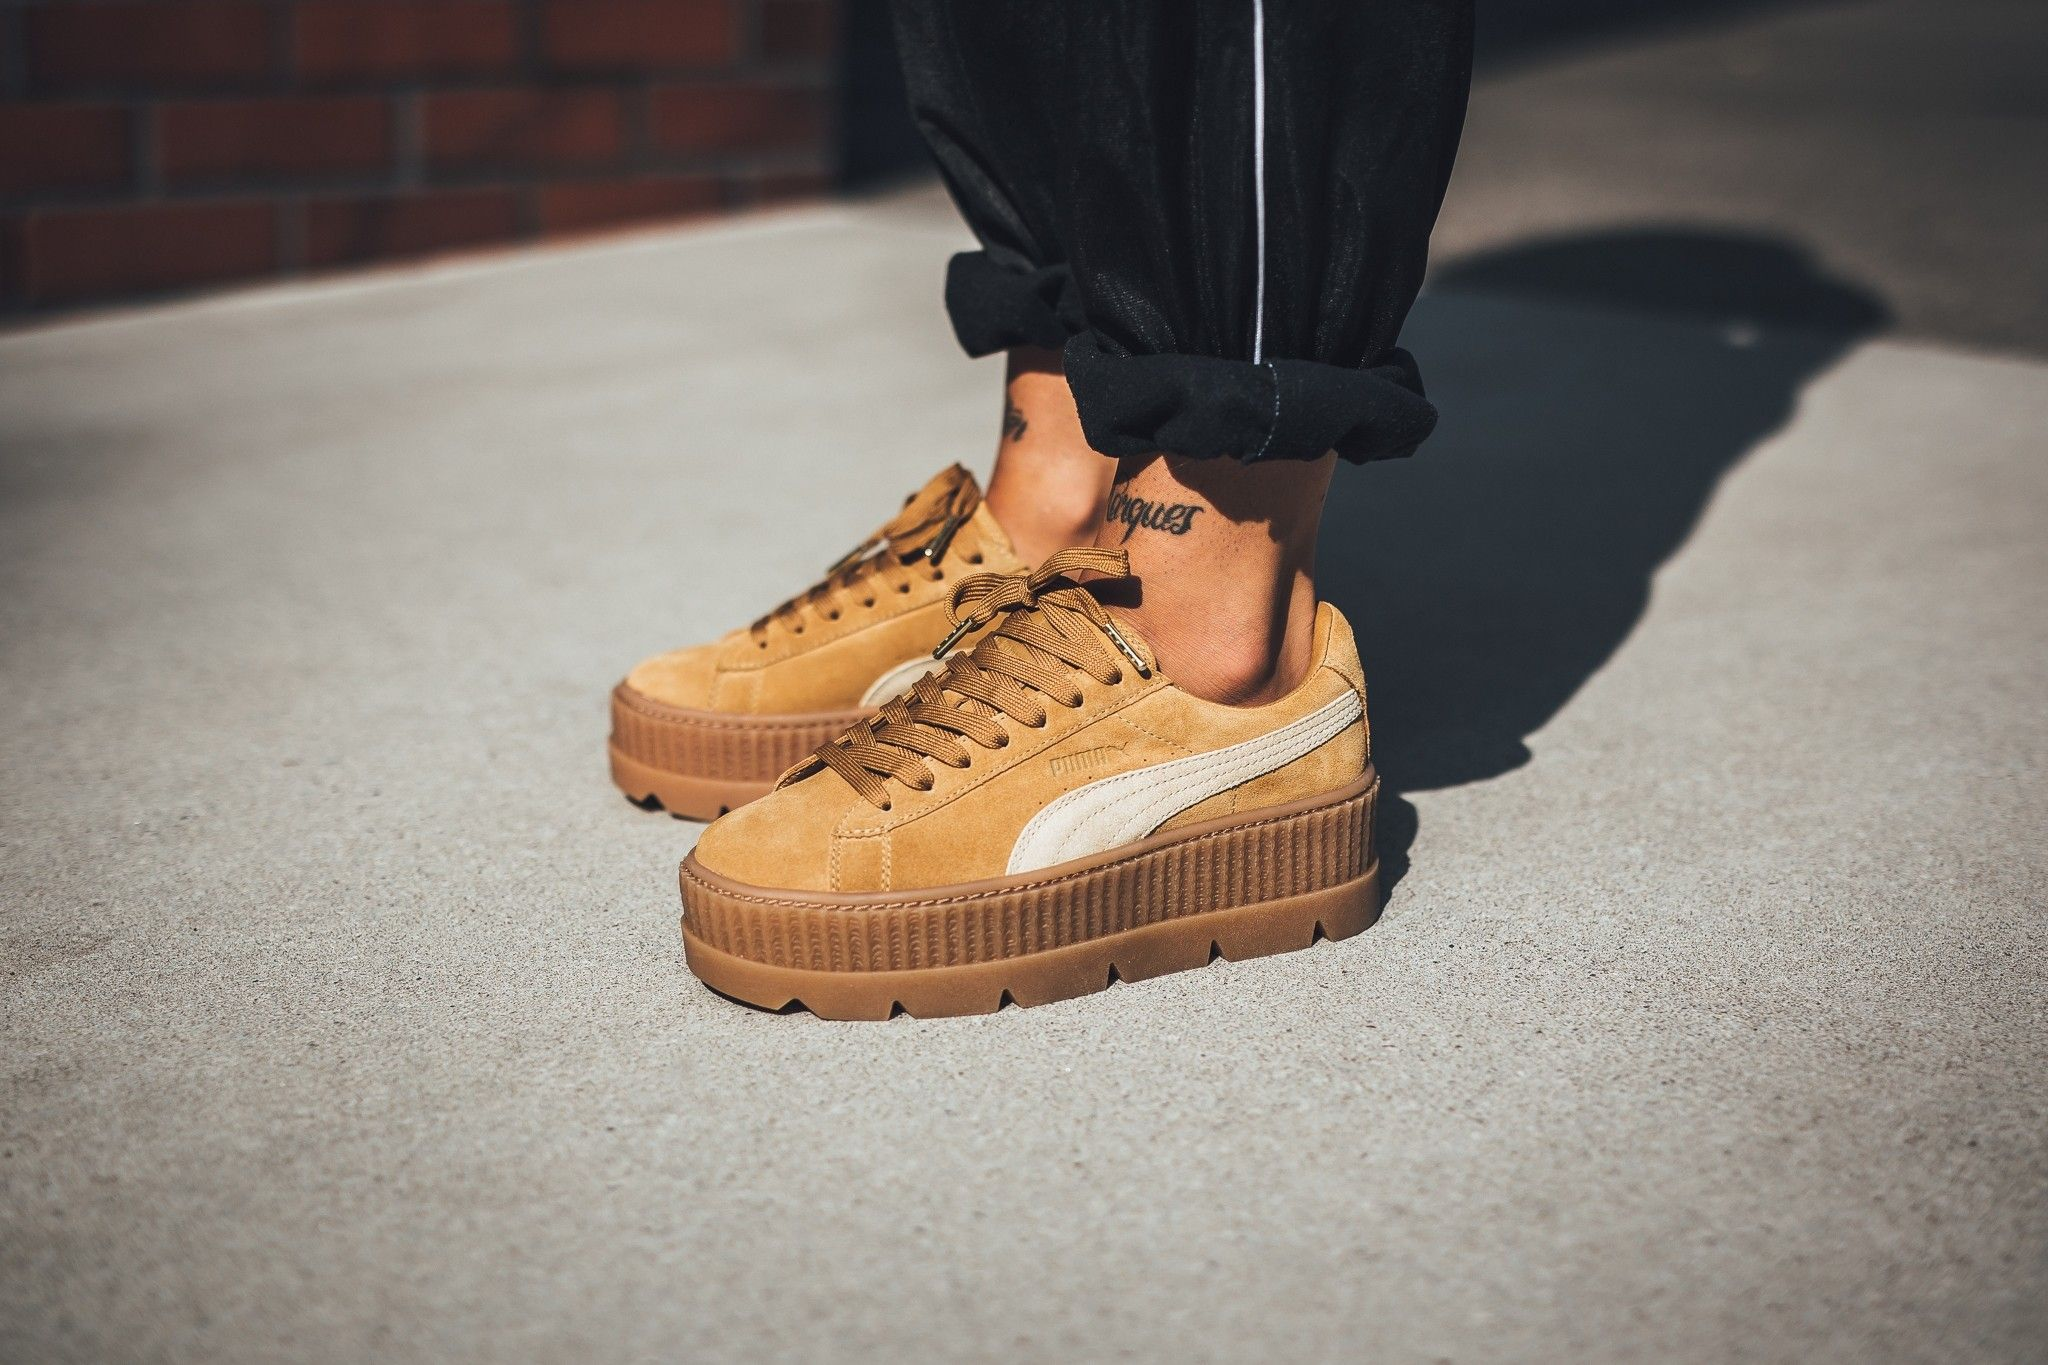 release date f830c 875d3 puma x rihanna cleated creeper 8/31/17 | Sneakers | Suede ...